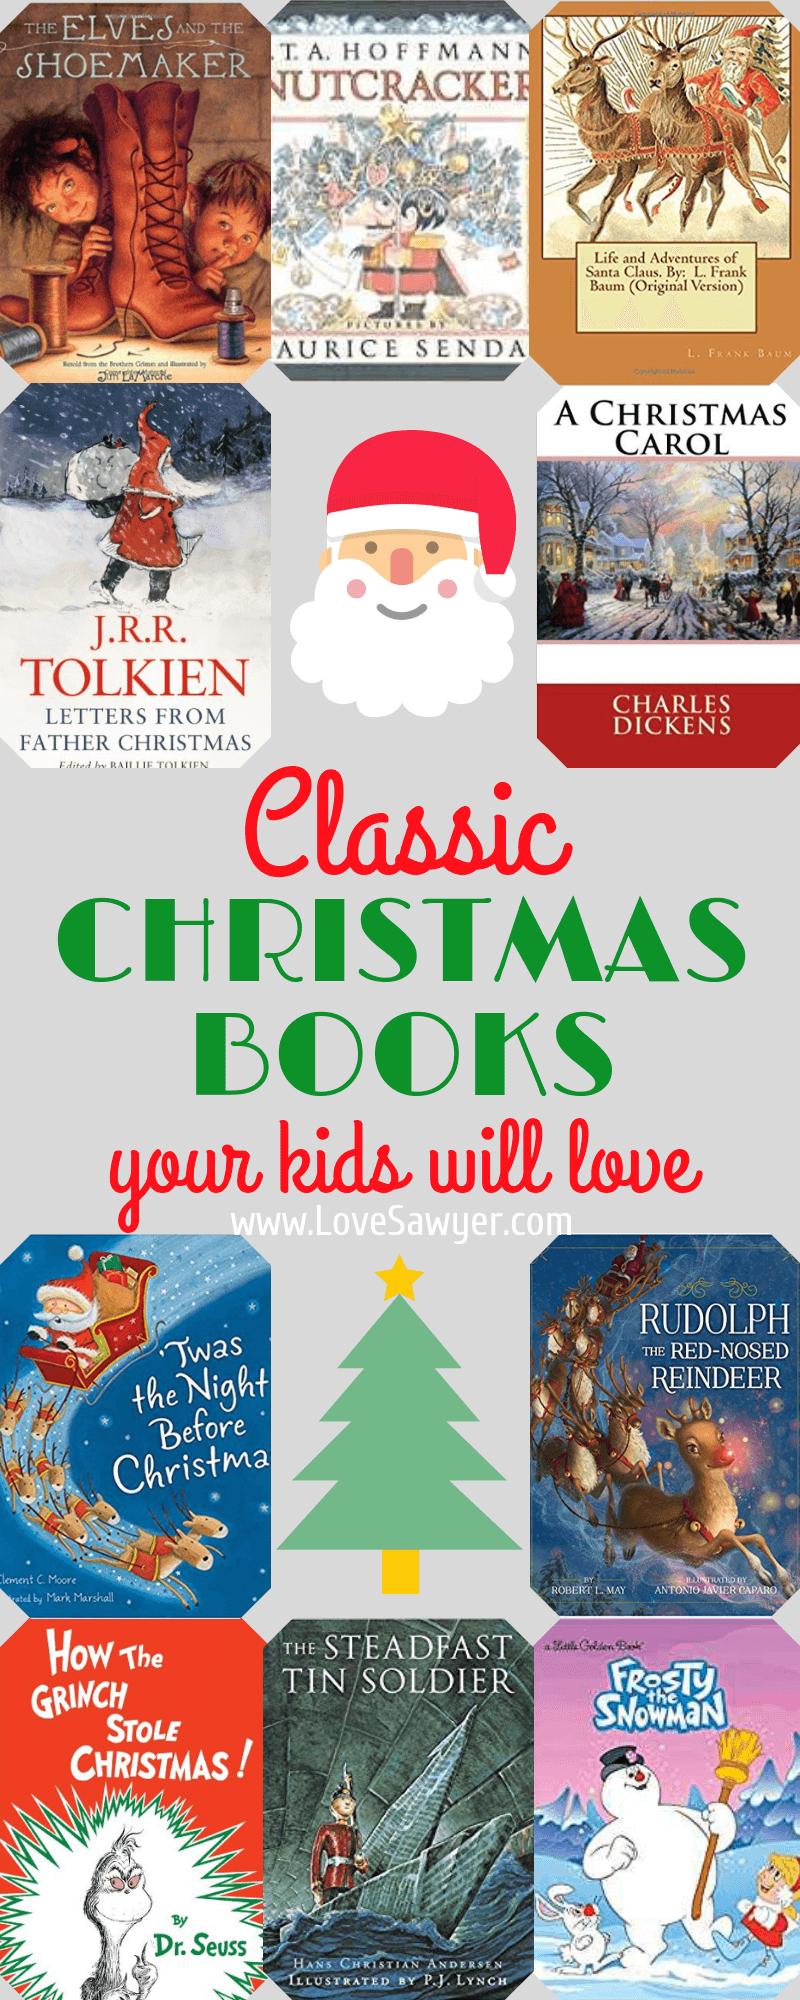 Classic Christmas Stories For Kids Love Sawyer Christmas Stories For Kids Classic Christmas Story Christmas Books